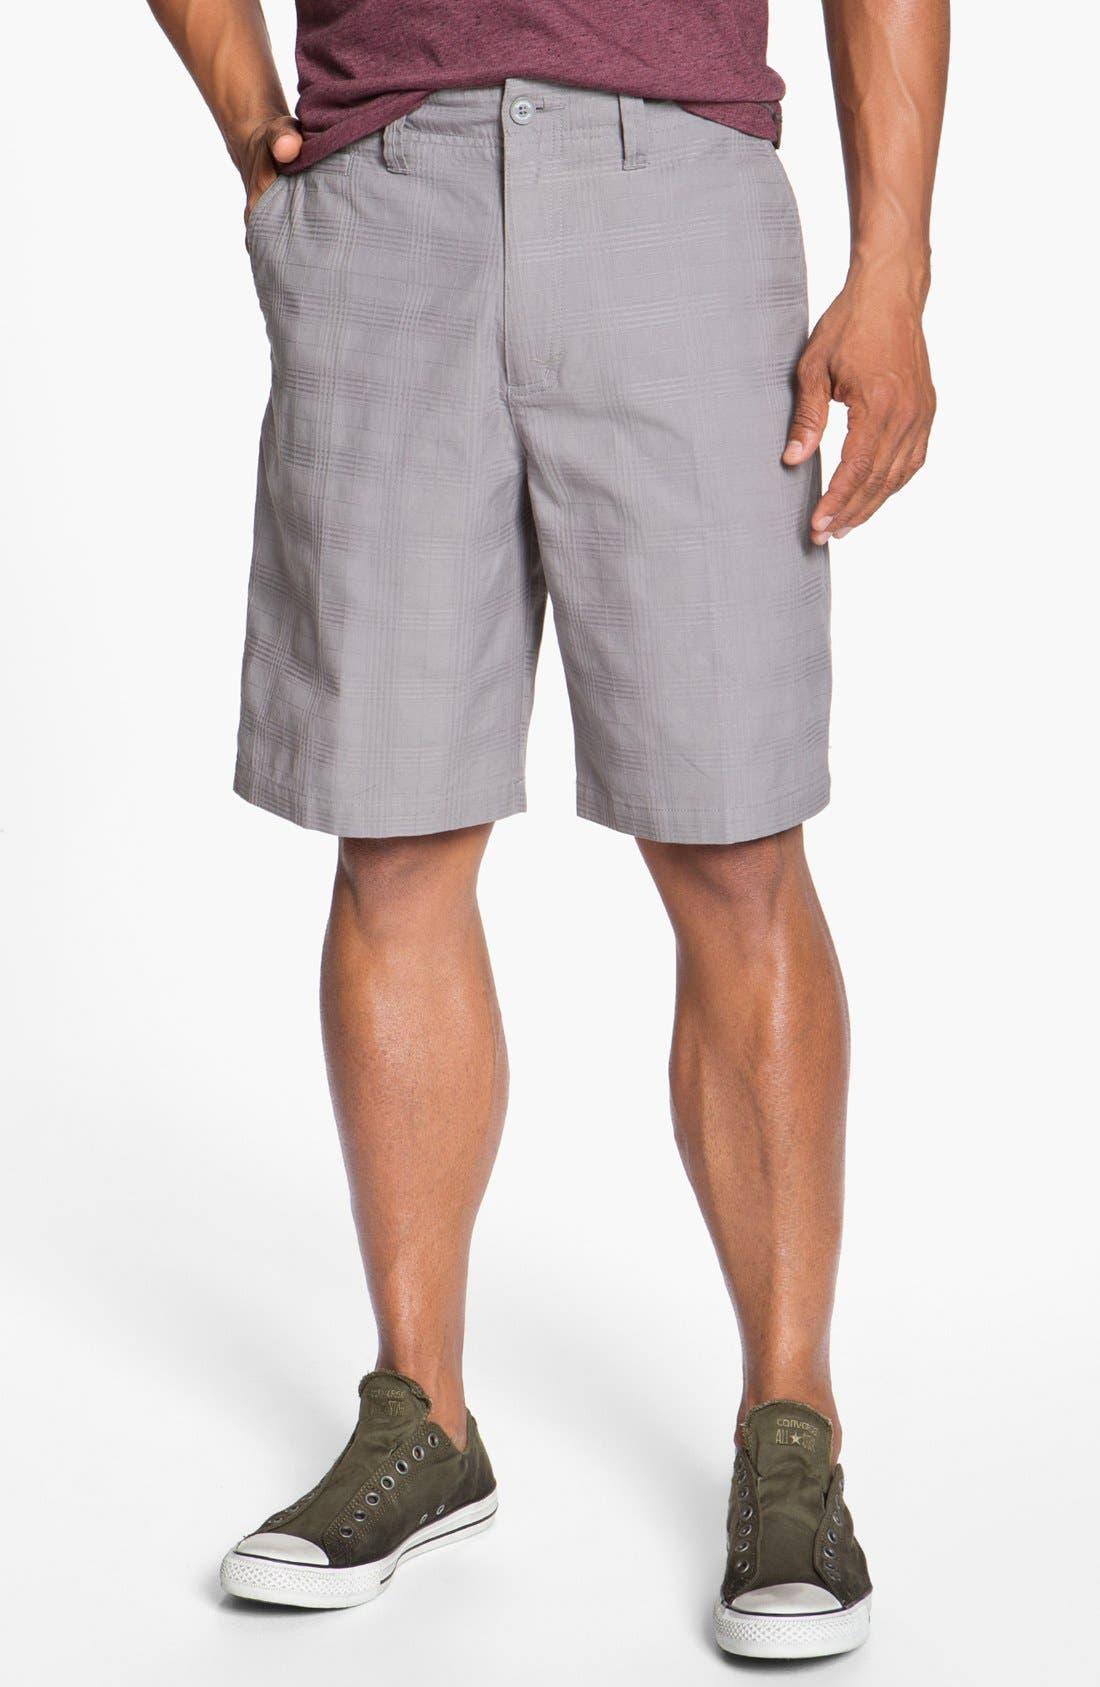 Alternate Image 1 Selected - Quiksilver Waterman 'Easy Rider' Shorts